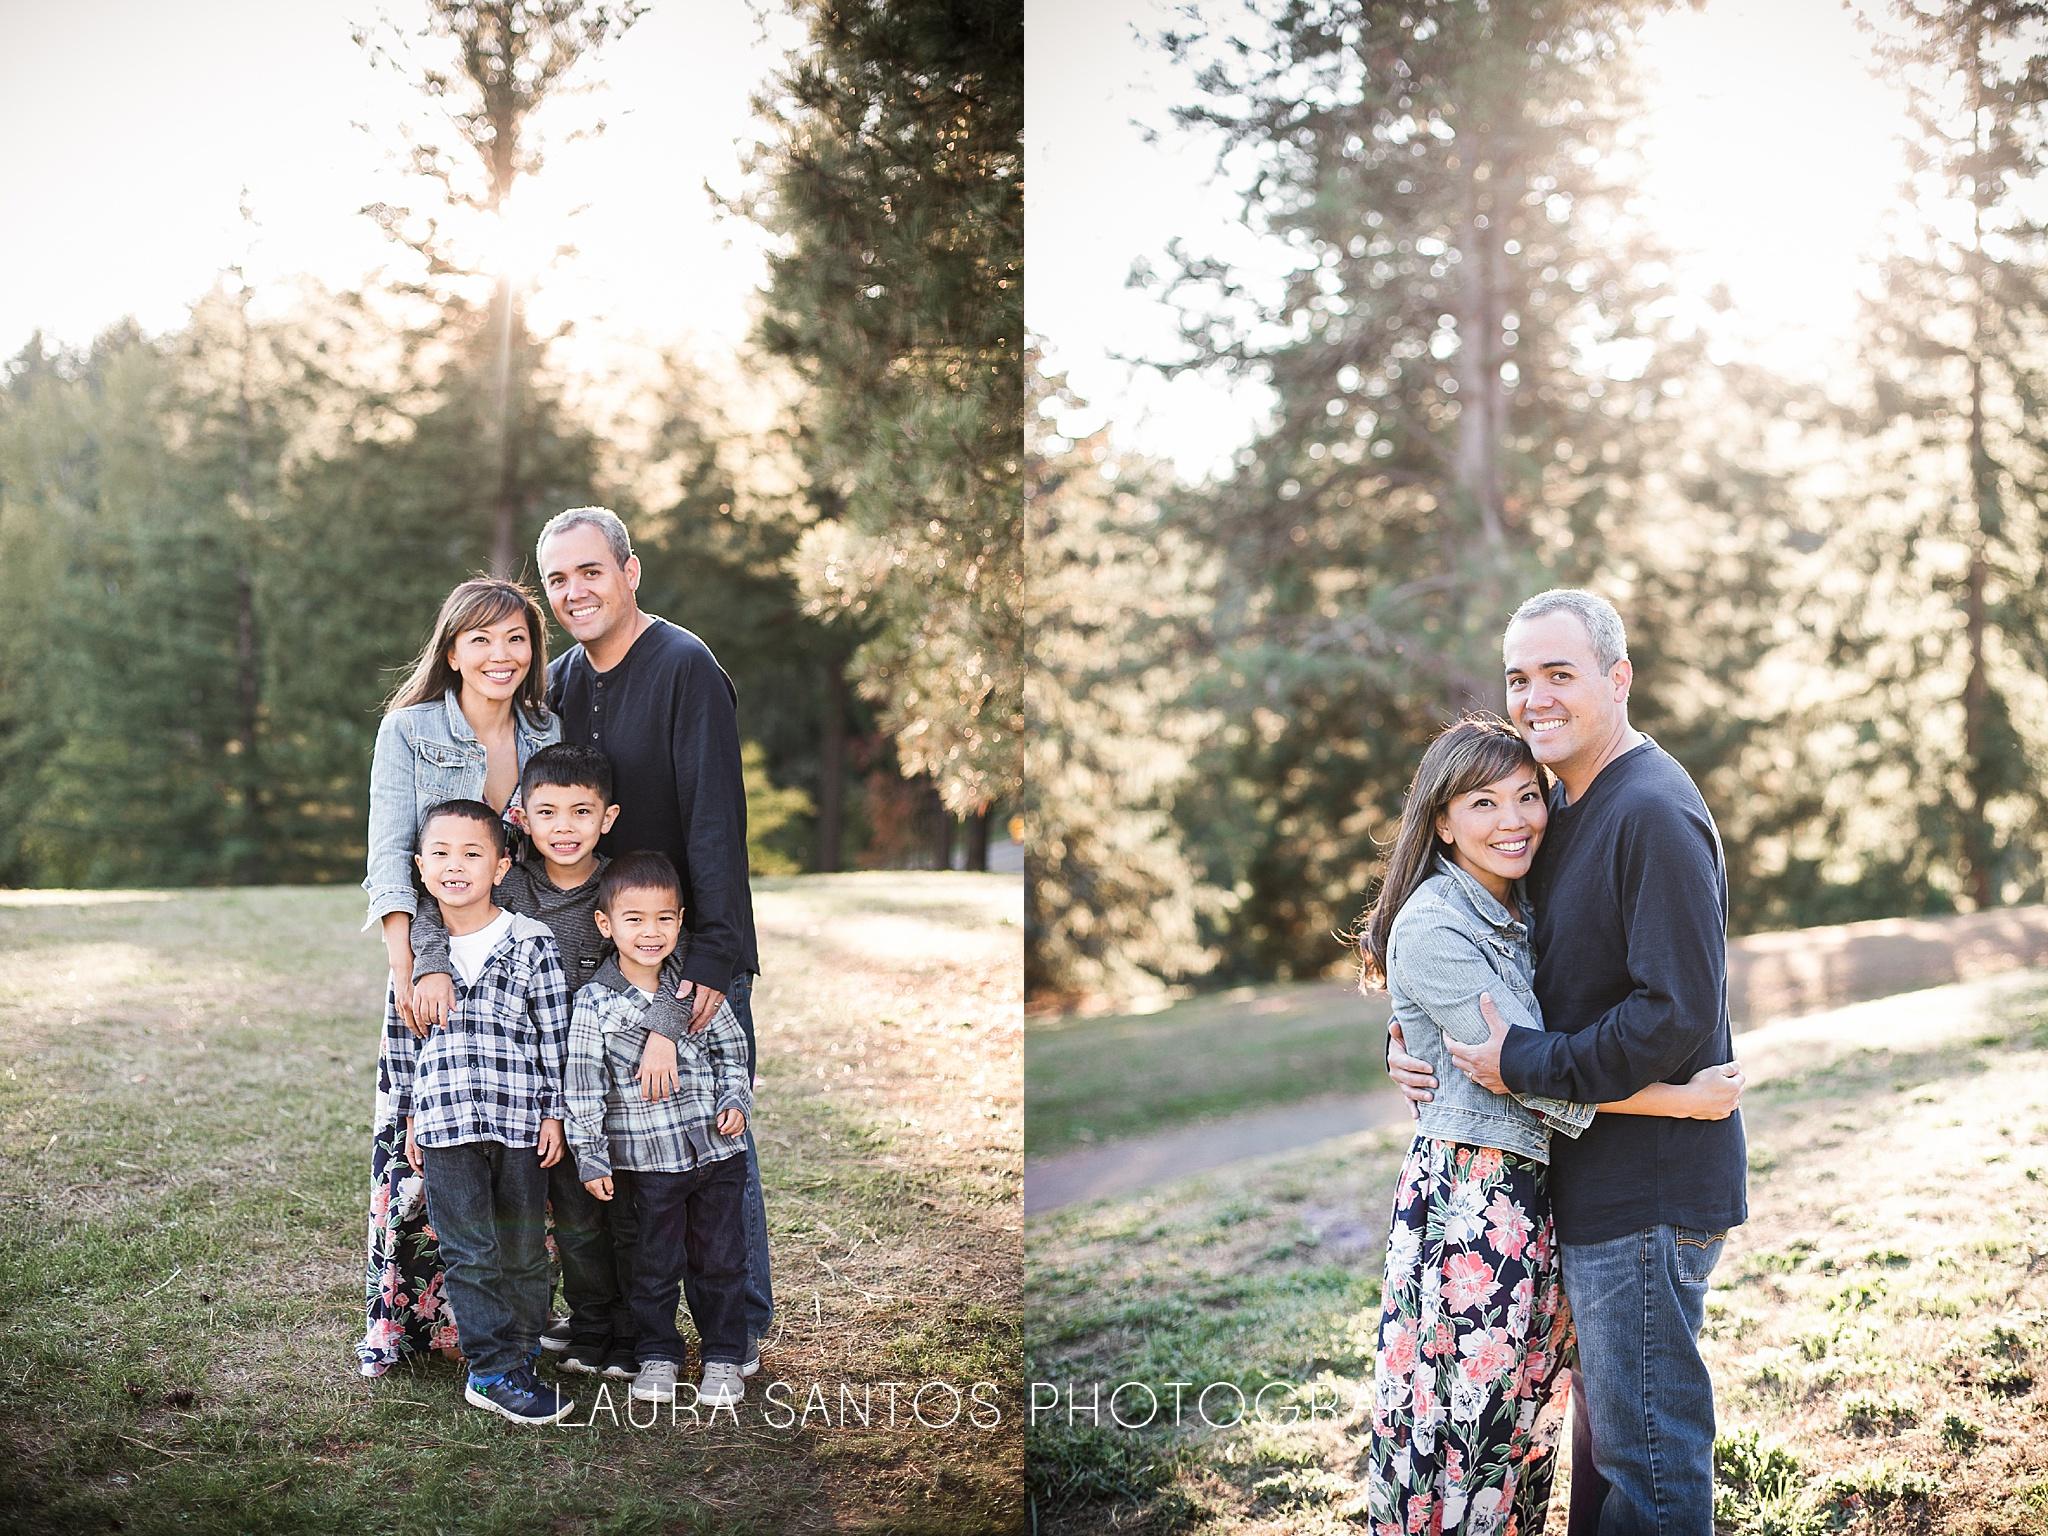 Laura Santos Photography Portland Oregon Family Photographer_0752.jpg